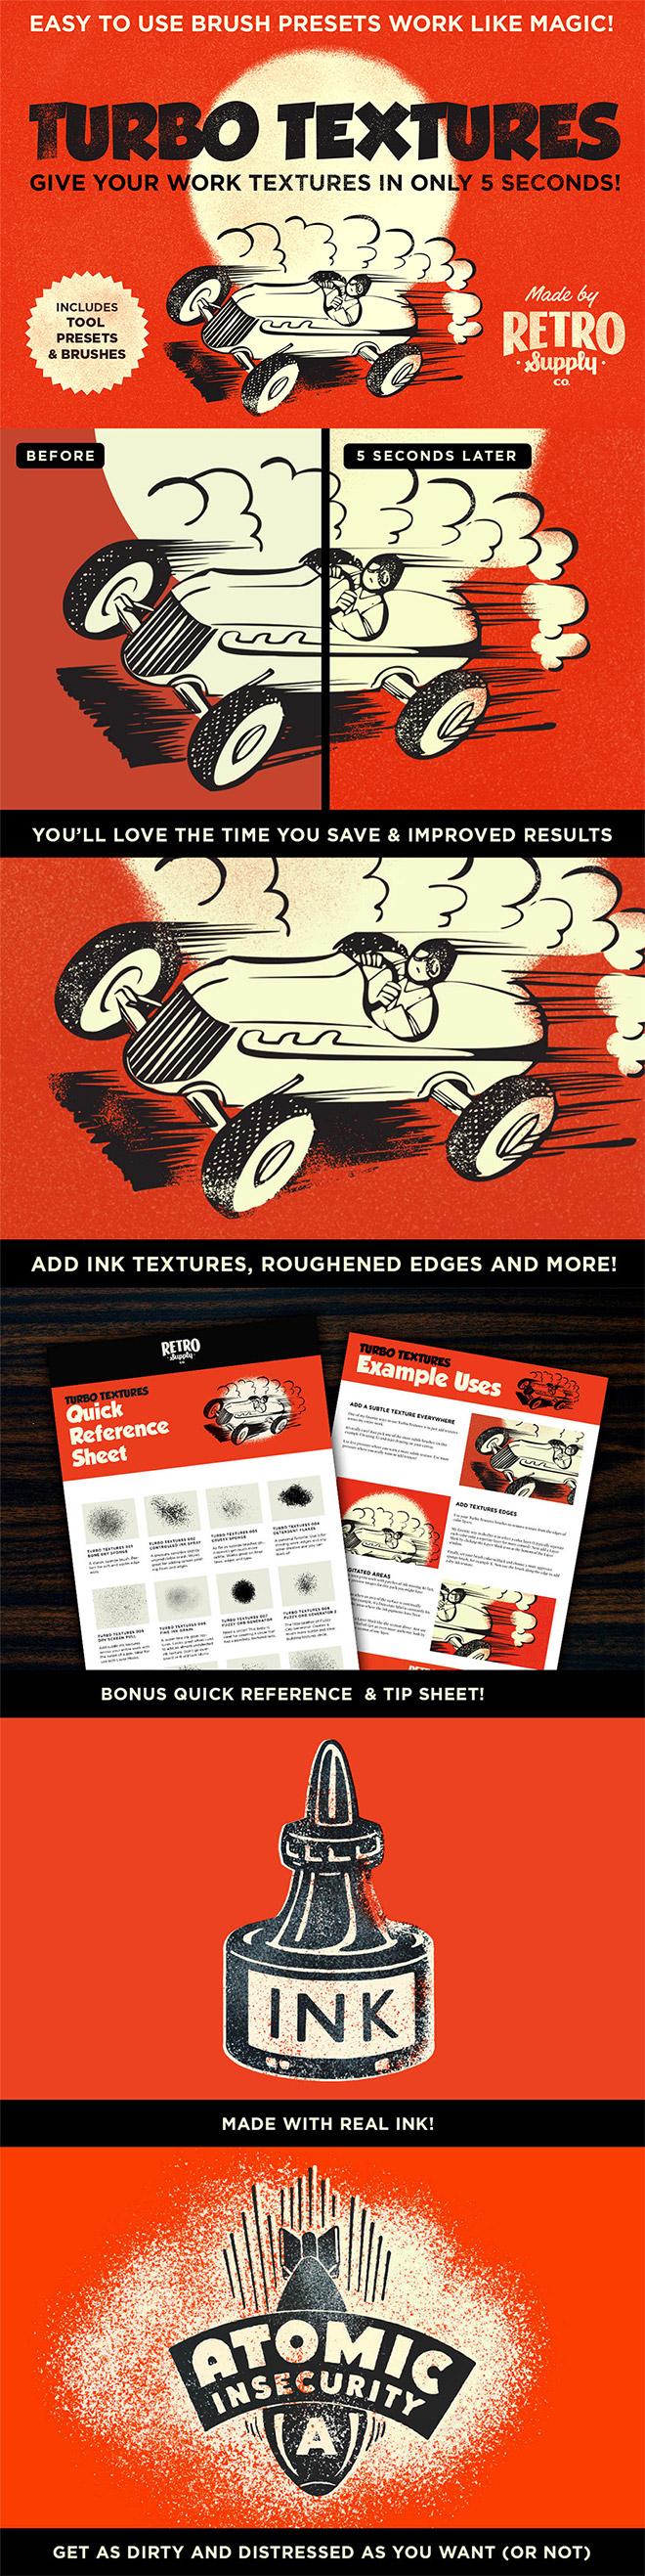 Turbo Textures – 5 Second Textures